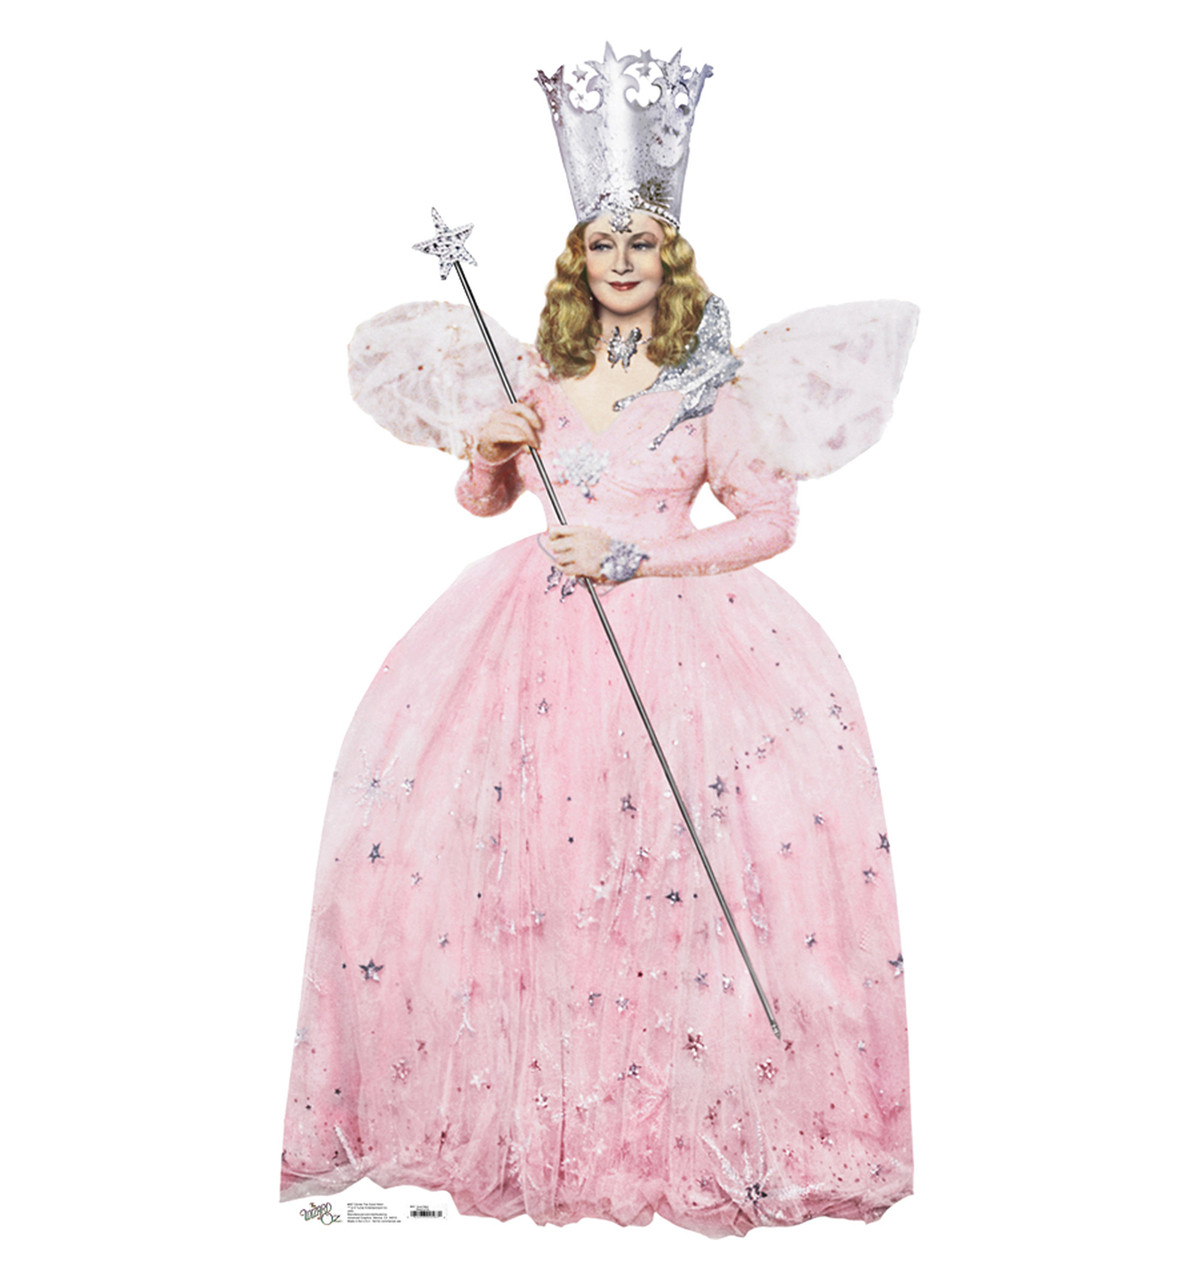 Life-size Glinda the Good Witch Cardboard Standup